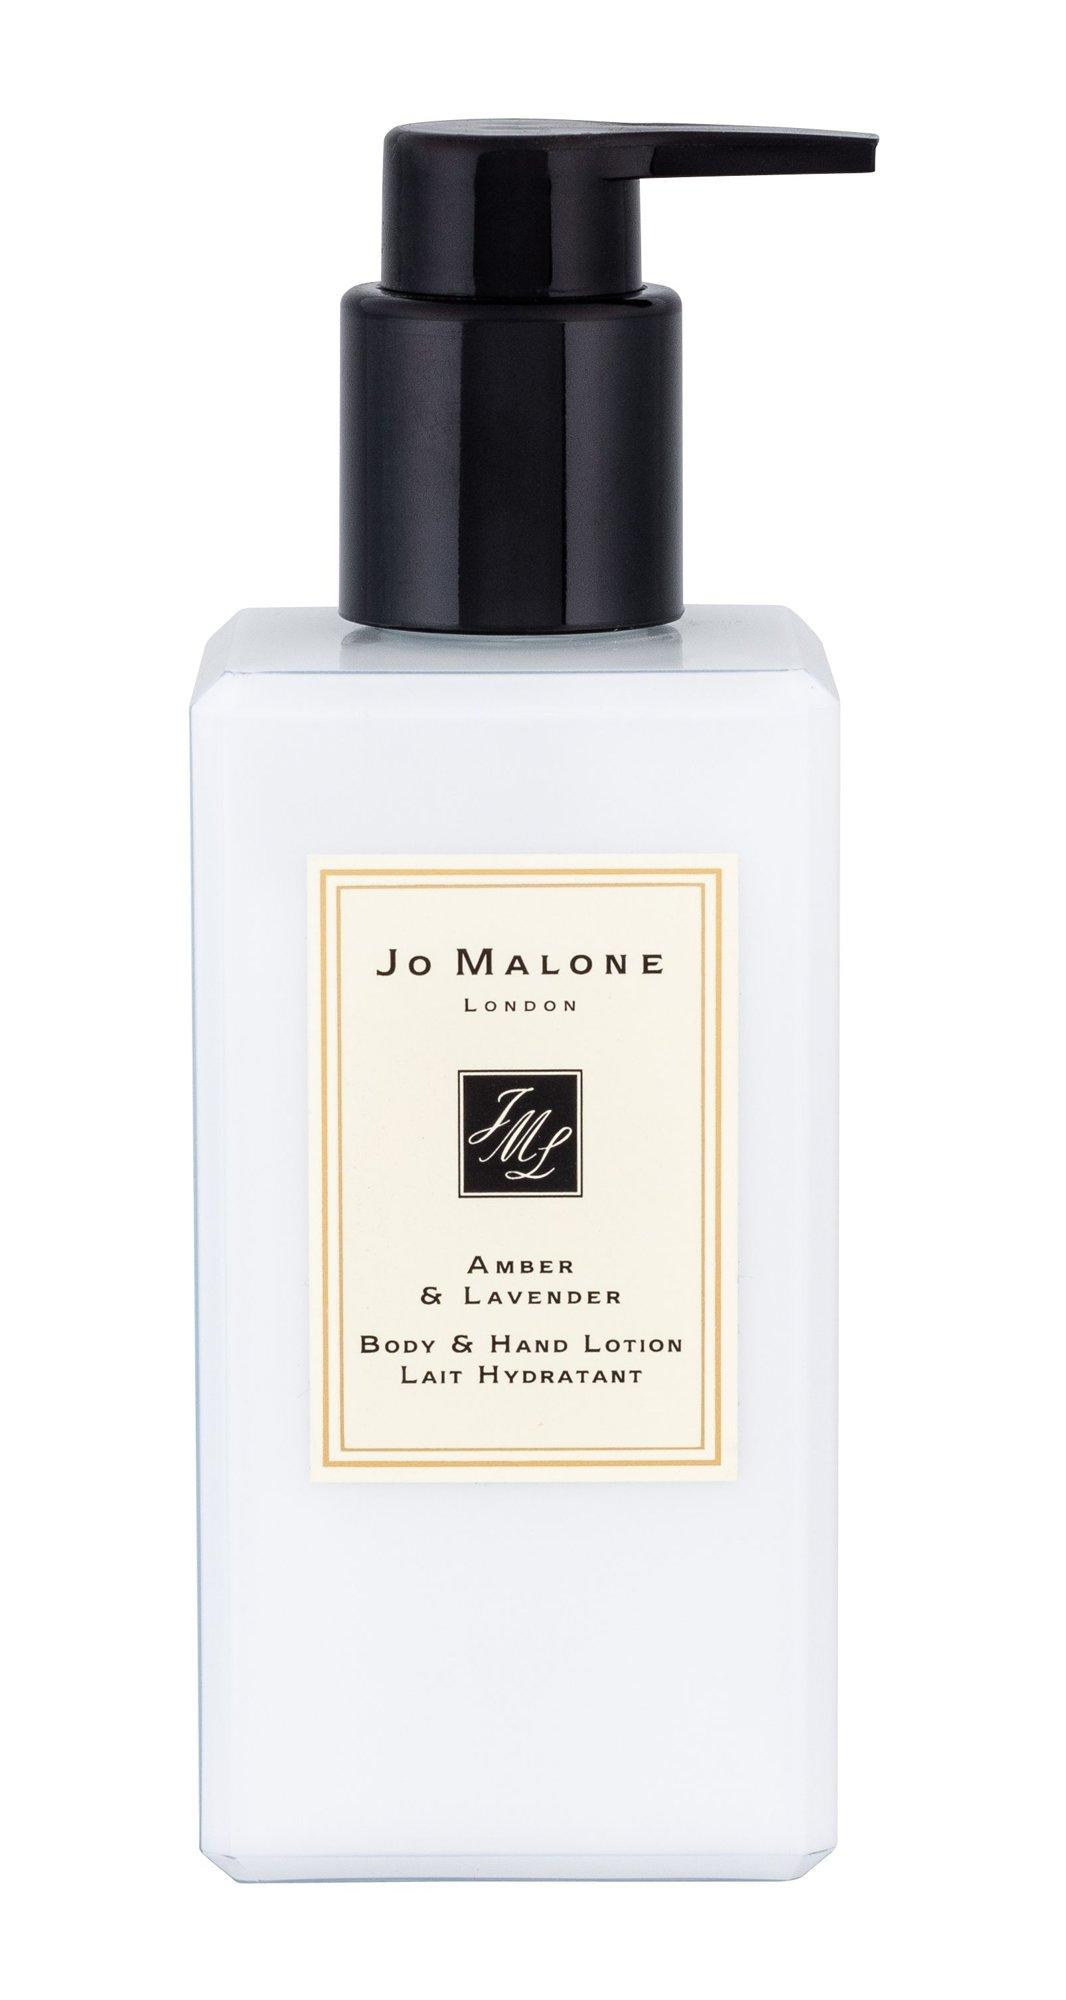 Jo Malone Amber & Lavender Body Lotion 250ml